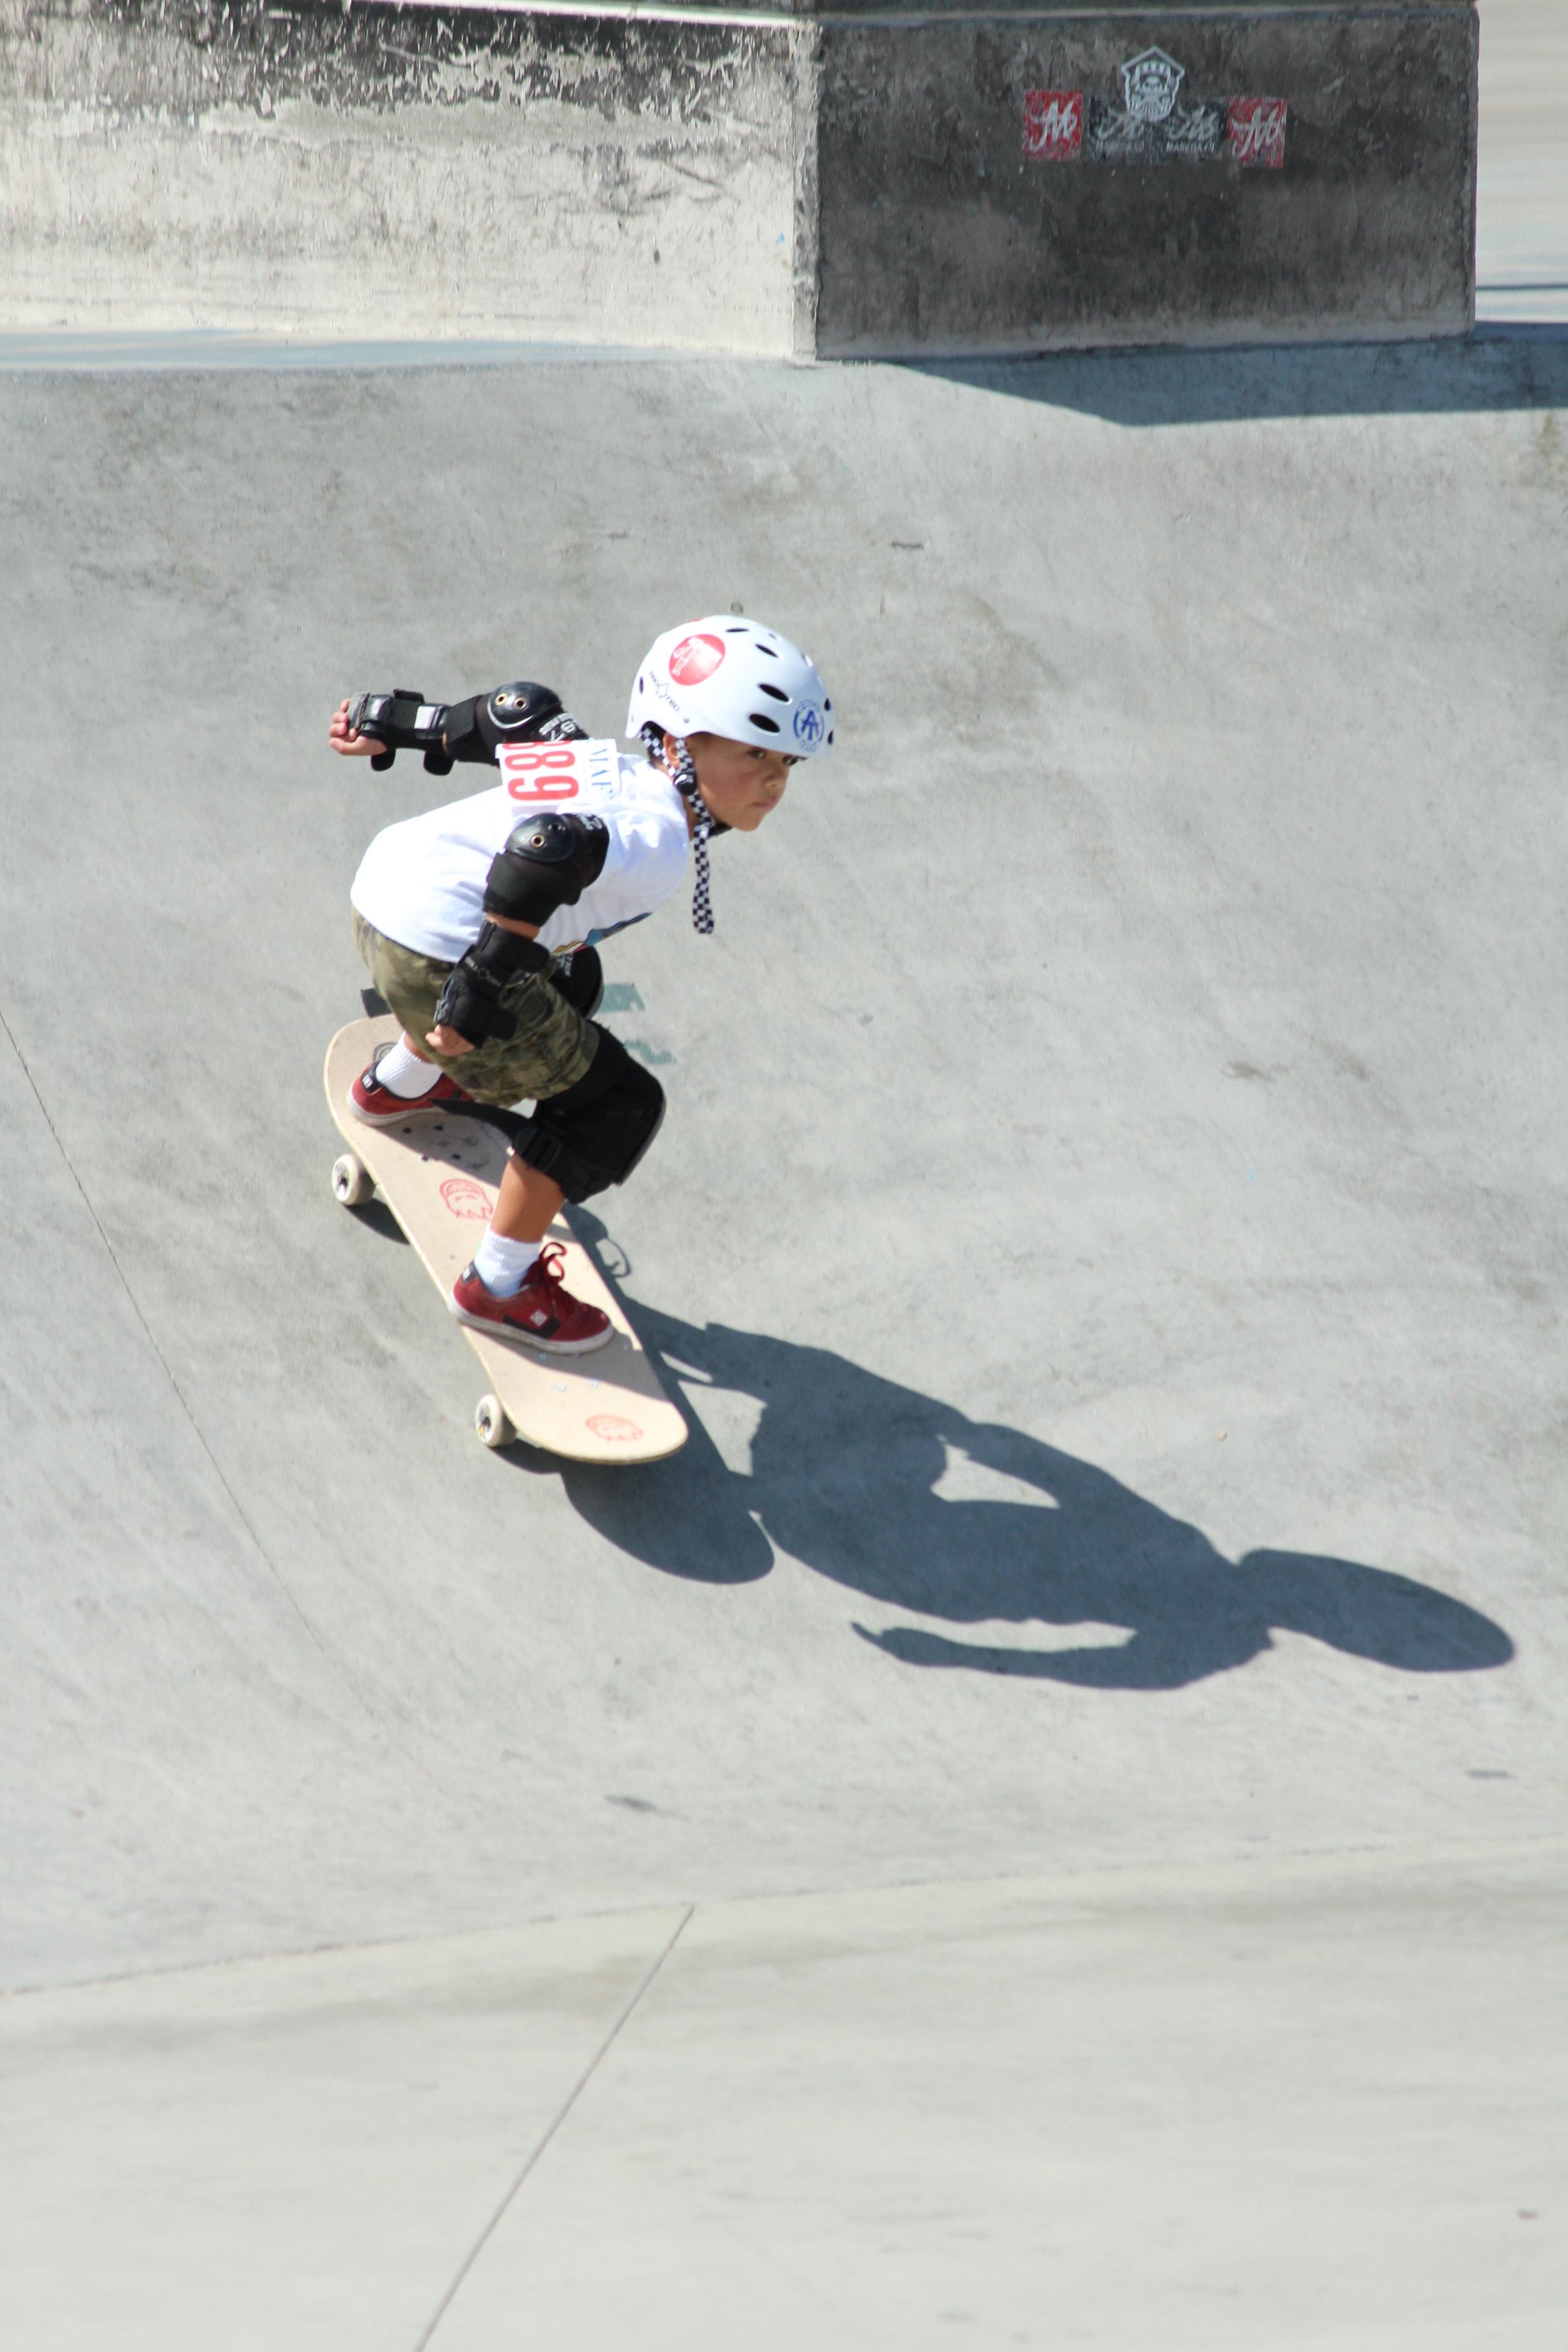 Skateboarding boy.JPG